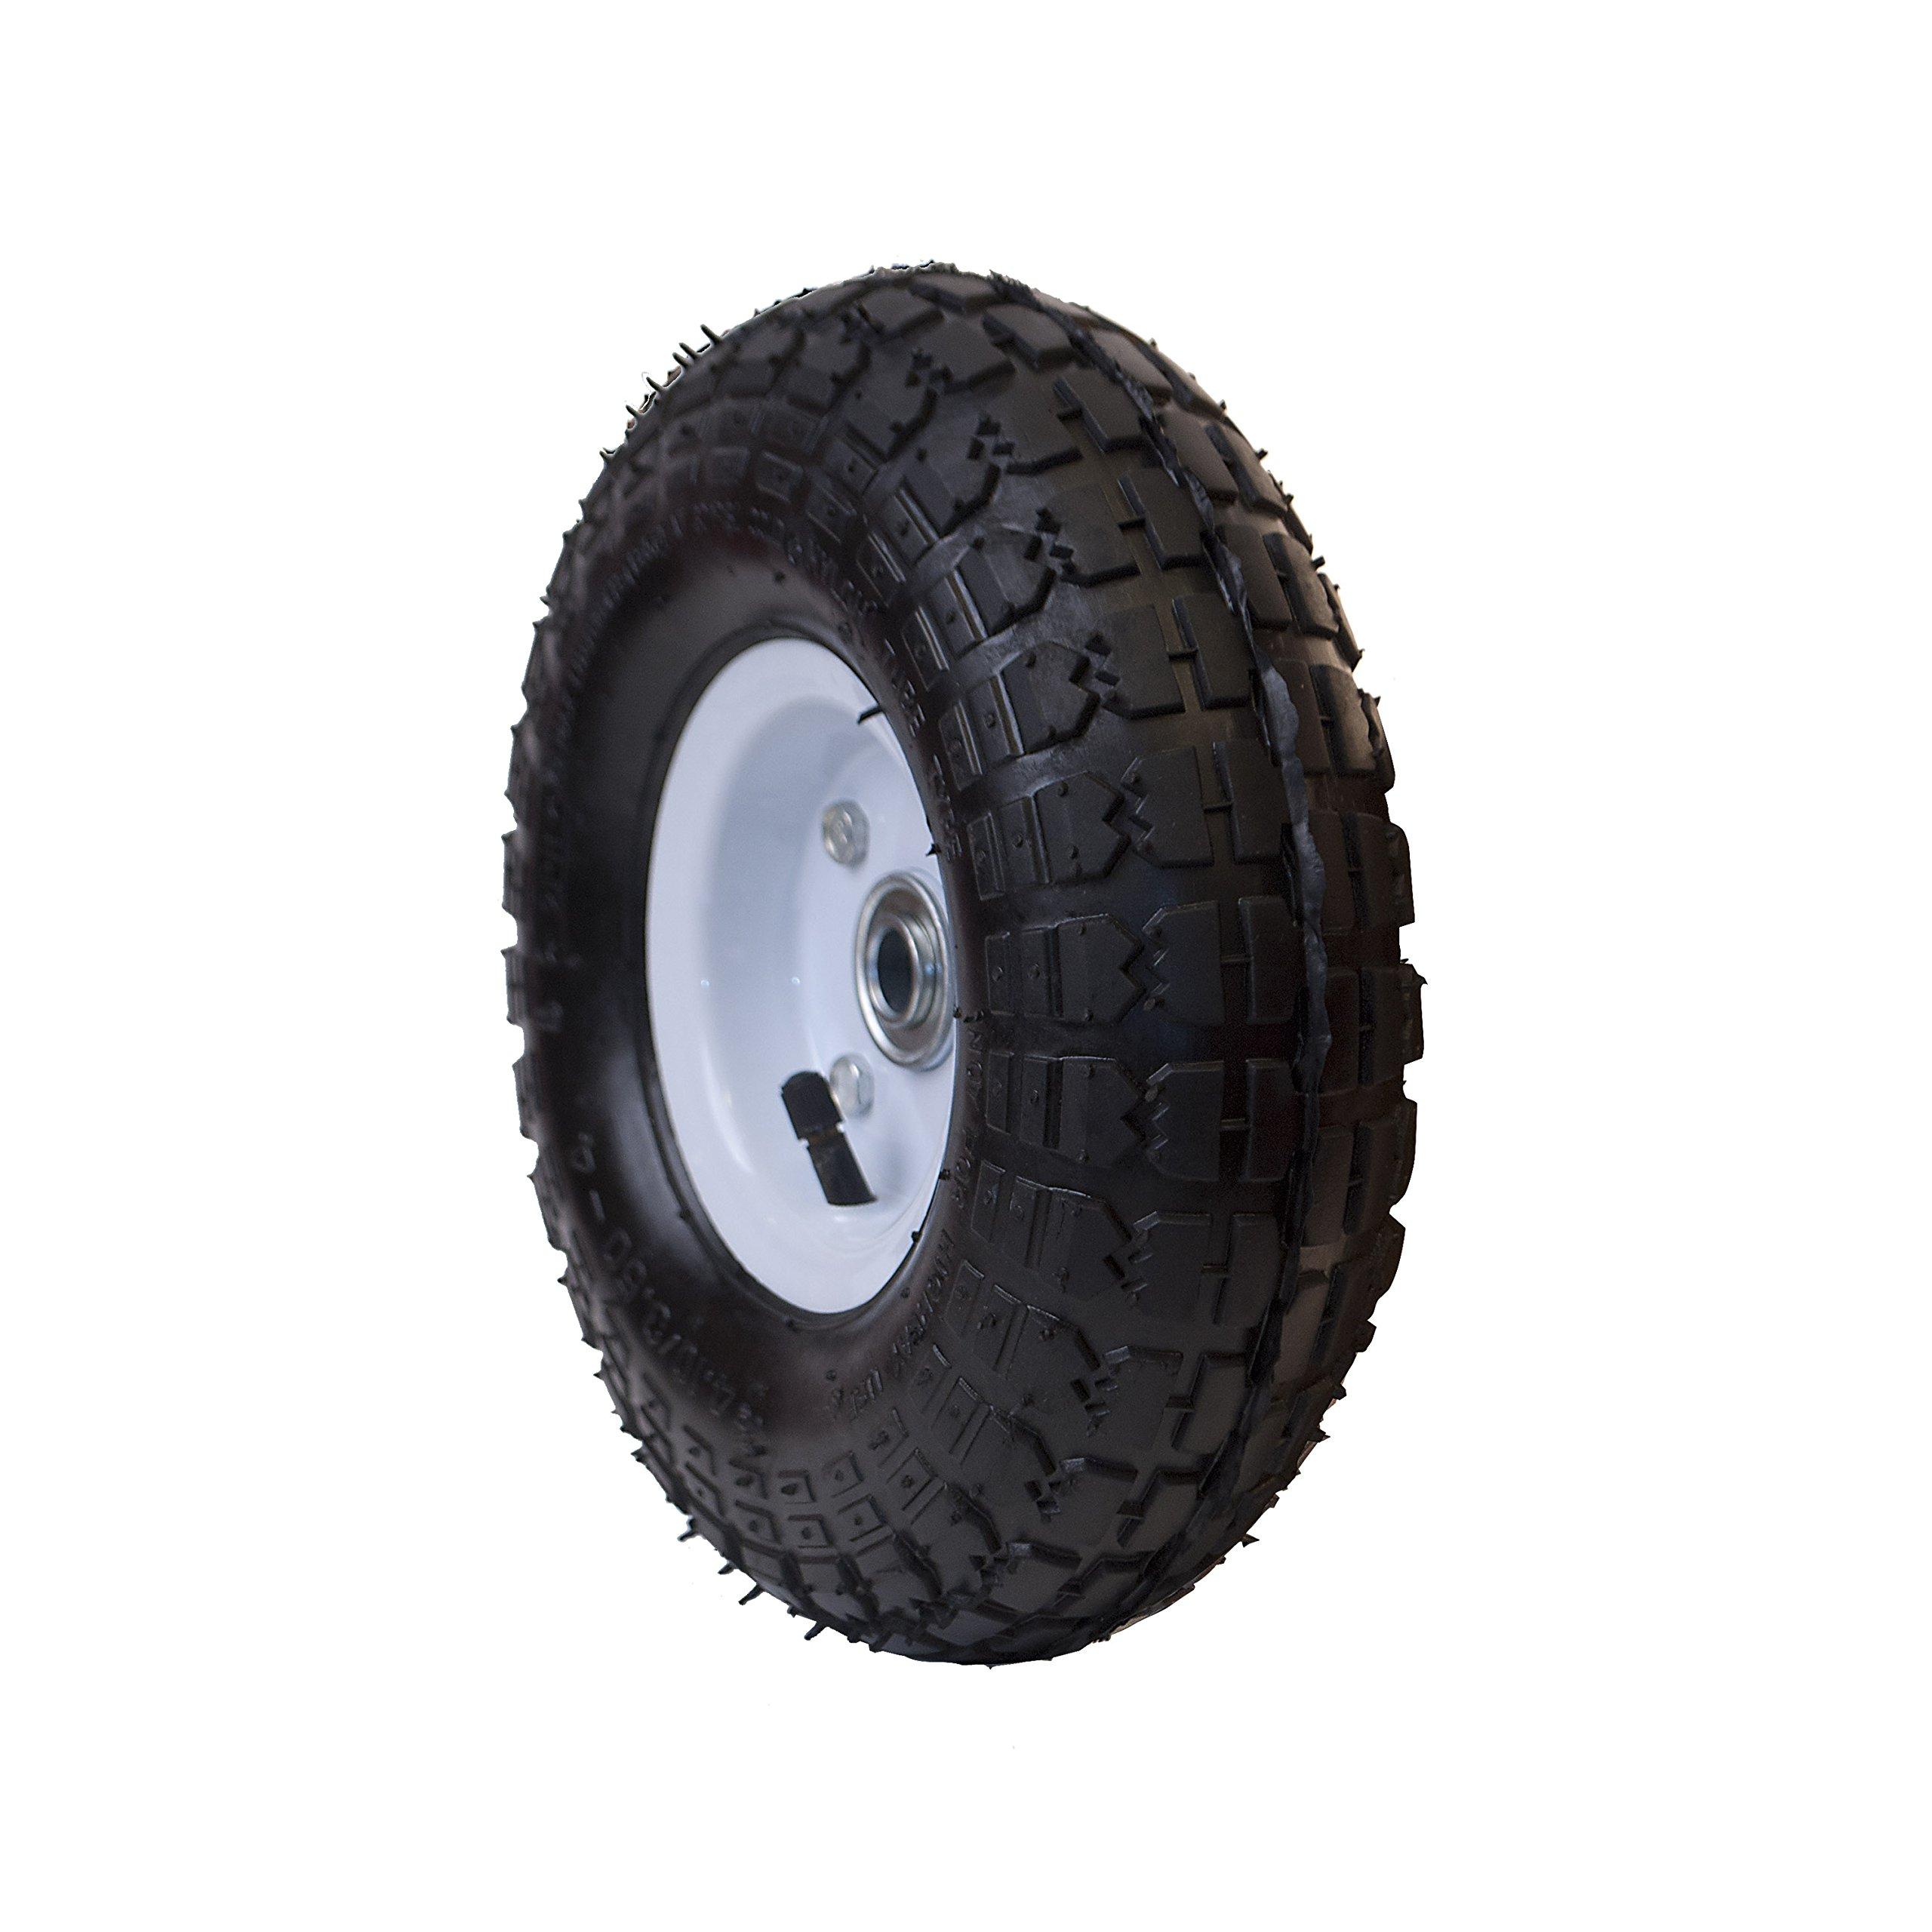 Ireko WAP10 Pneumatic Replacement Wheel for Wheelbarrow Air Filled Turf Tire for Hand Trucks 10 Inches Black White Rim